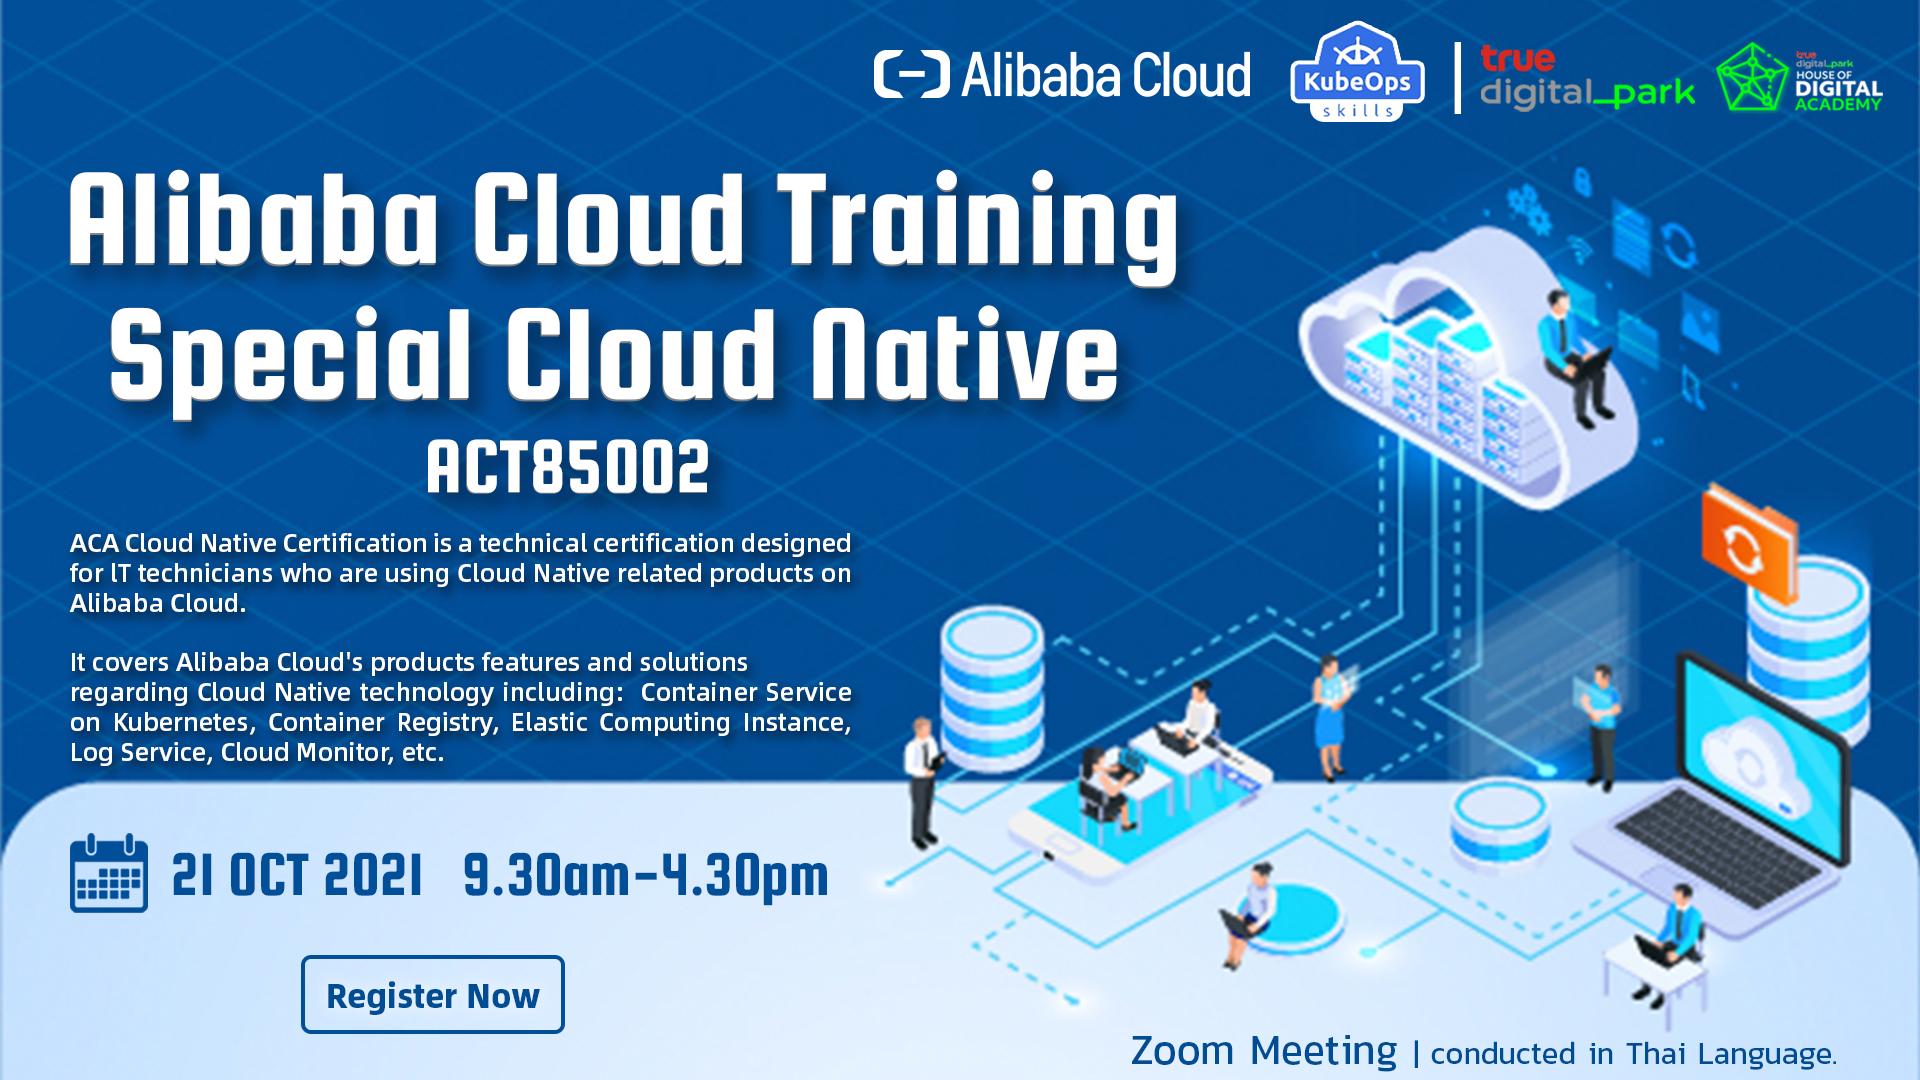 ACT85002: Alibaba Cloud Training Cloud Native